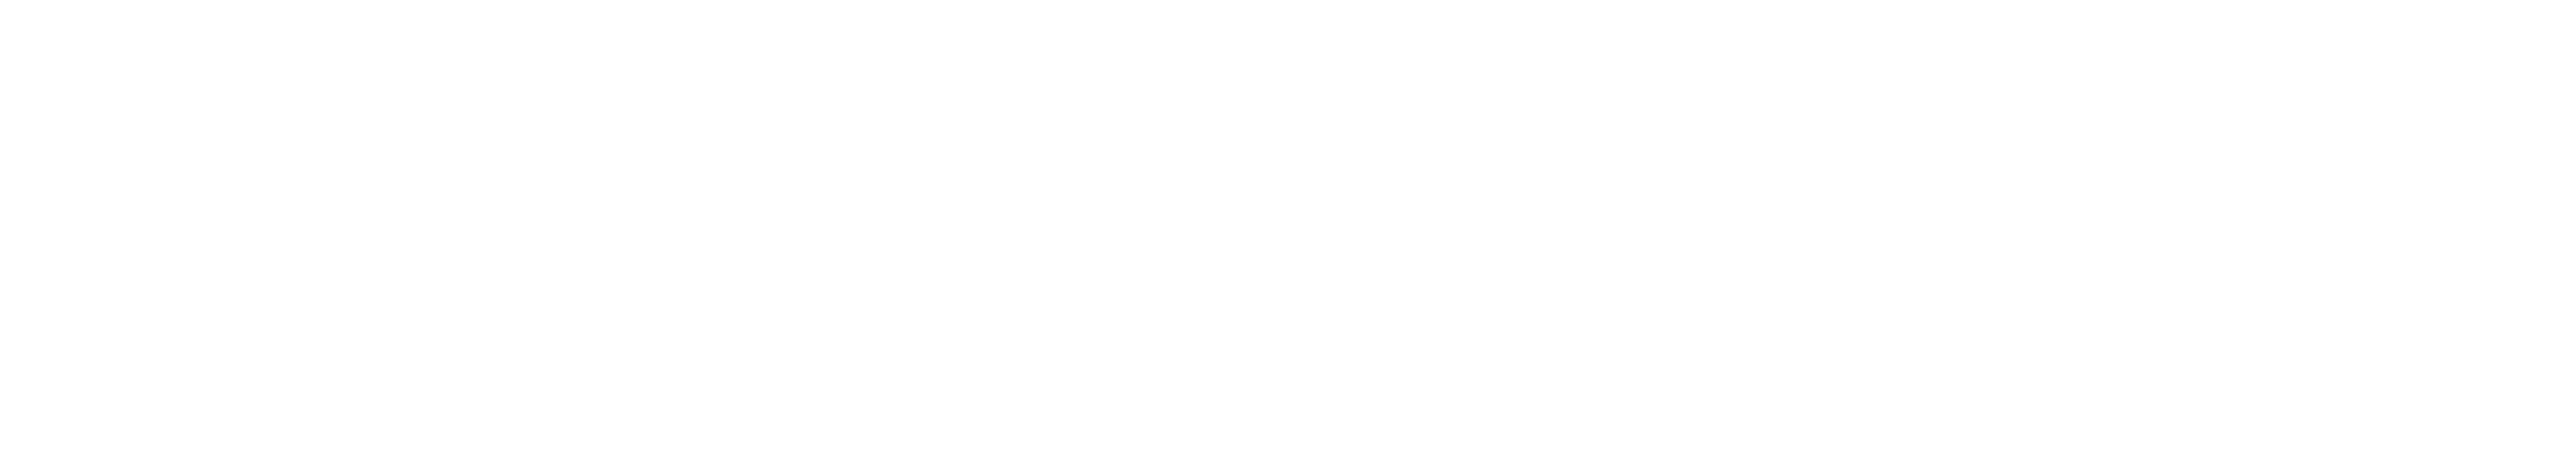 extras-aus-holz